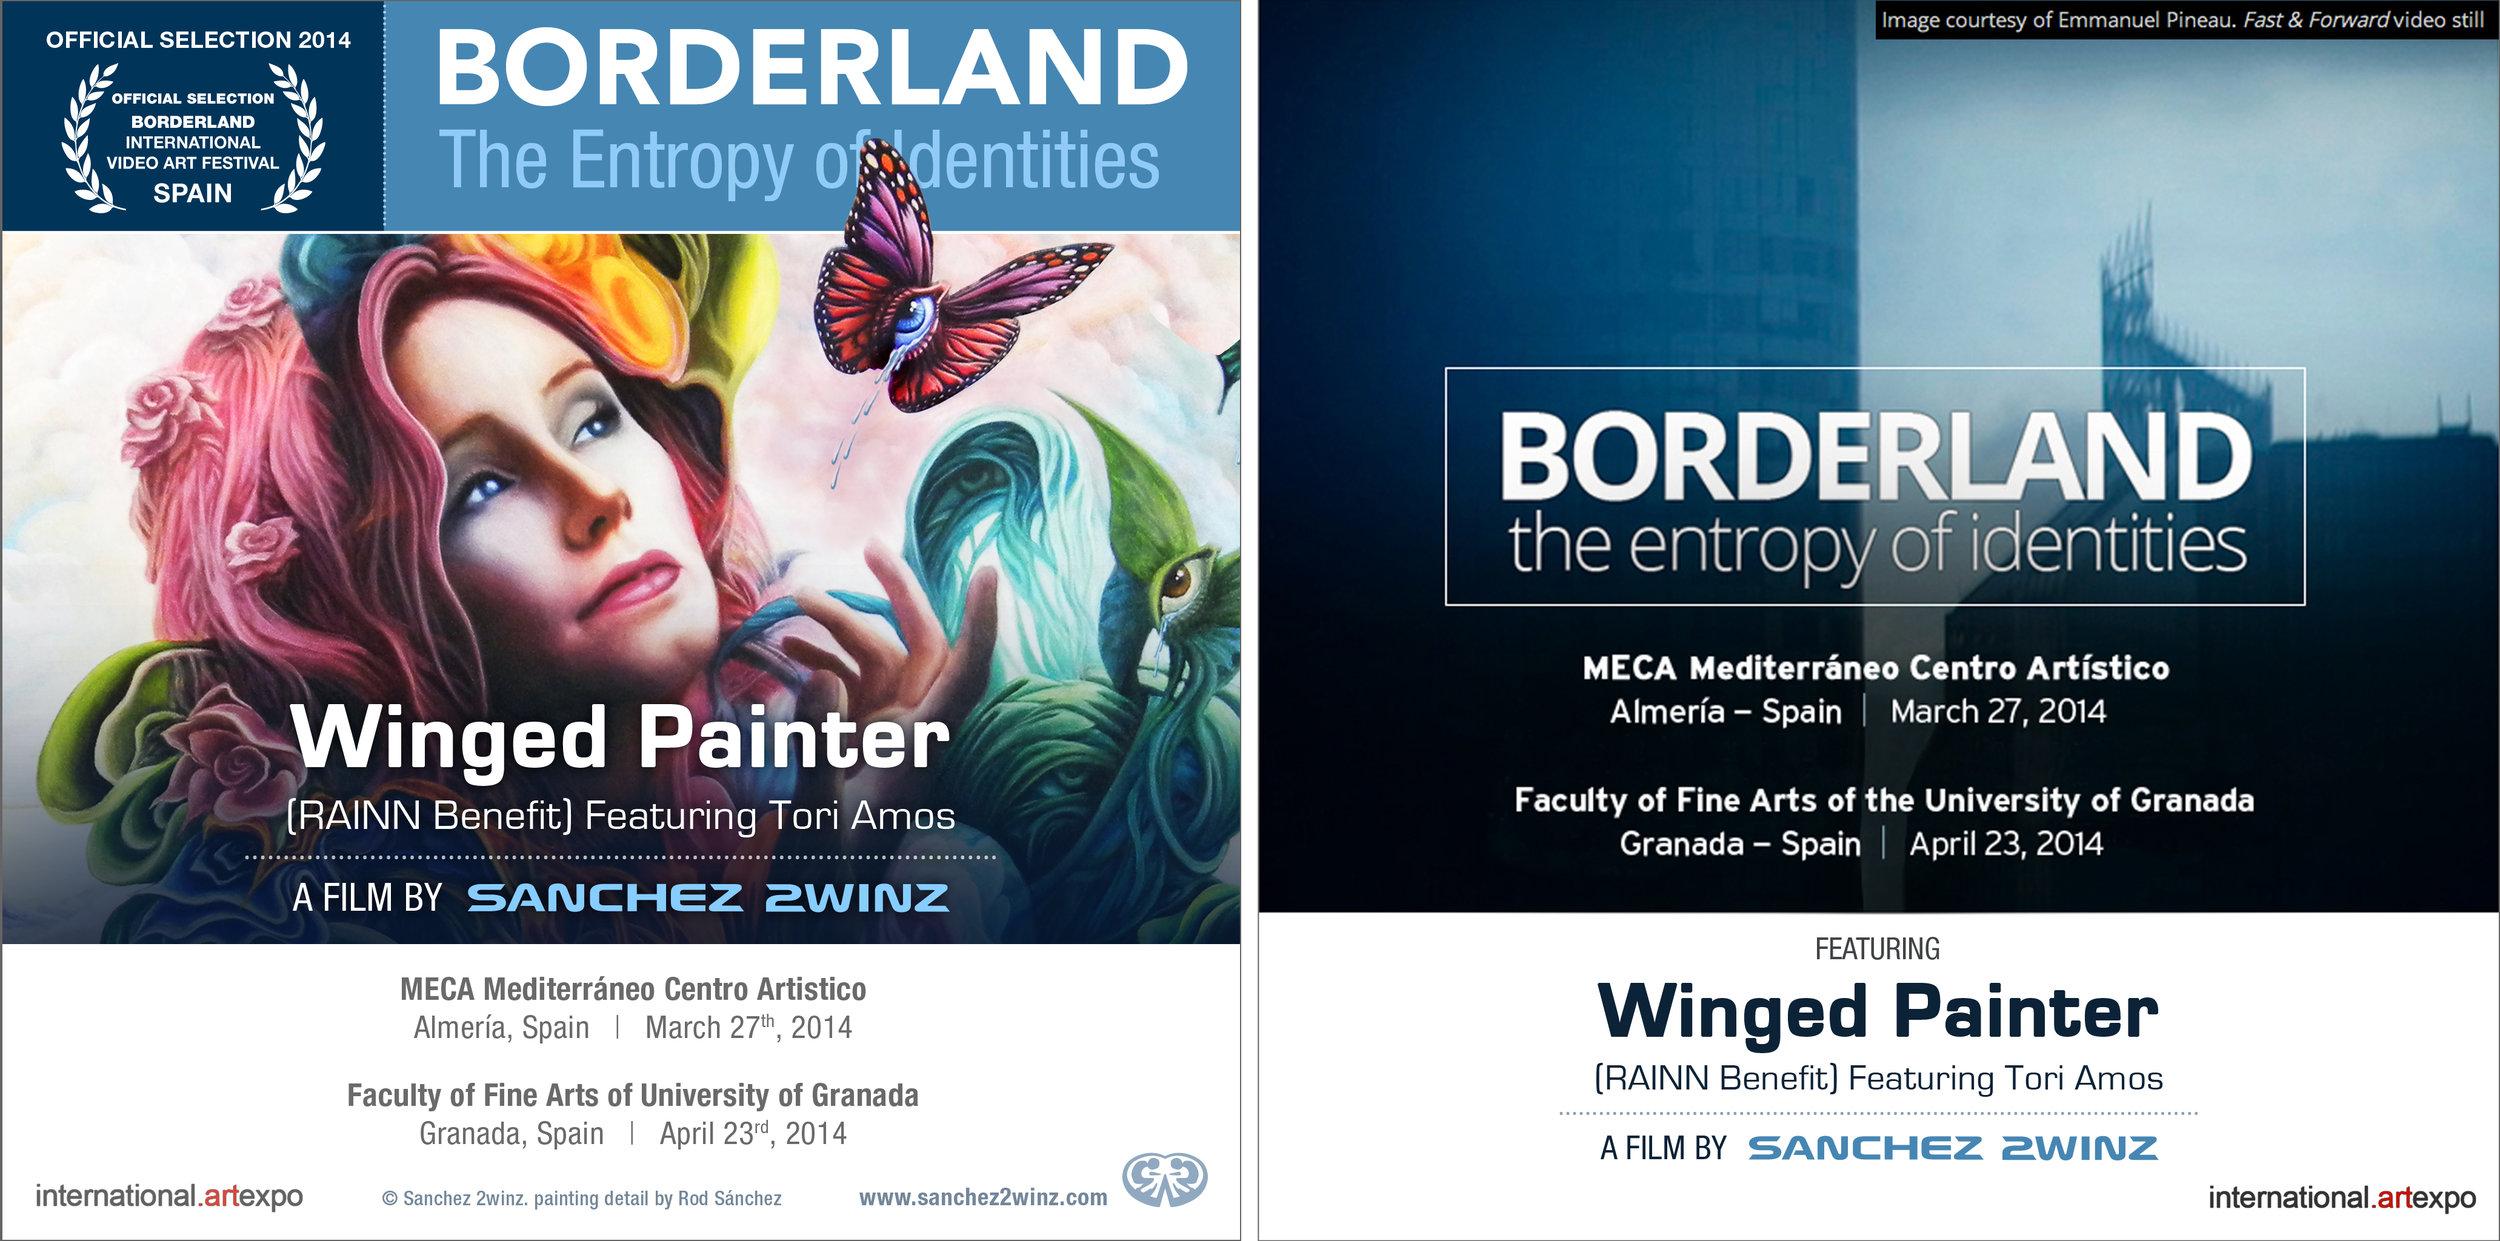 News_BorderlandVideoArtFestival_WingedPainter_RodSanchez_Sanchez2winz.jpg